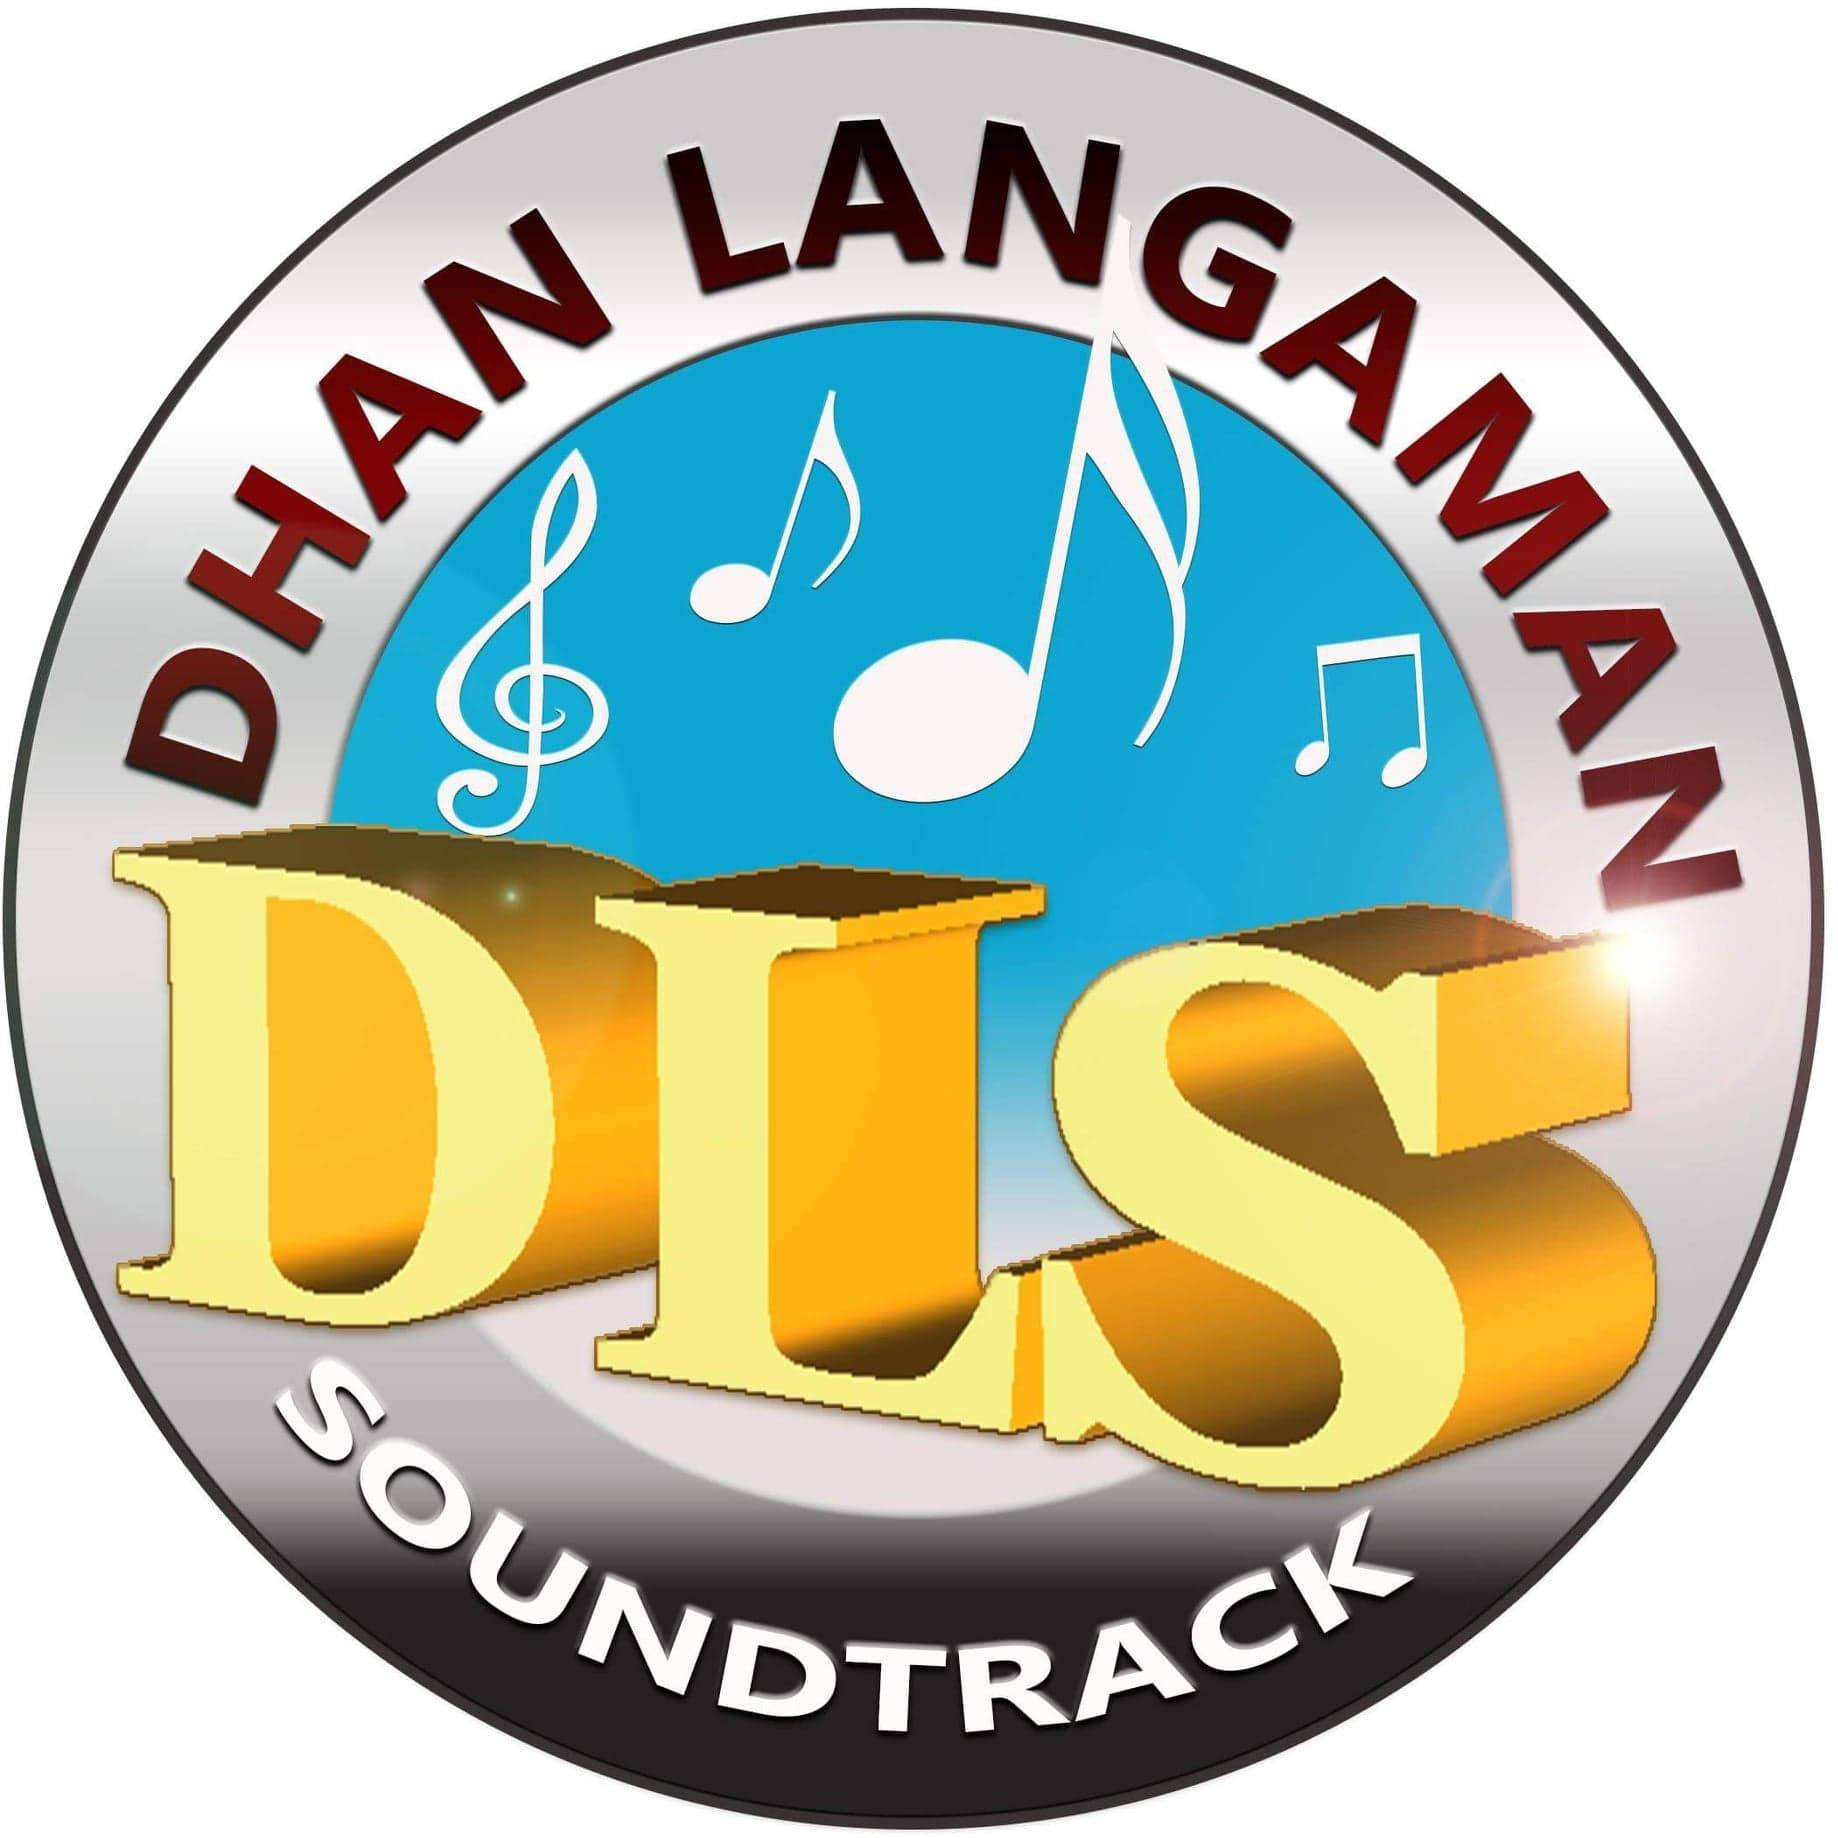 Радио DLS SOUNDTRACK ONLINE RADIO Филиппины, Манила